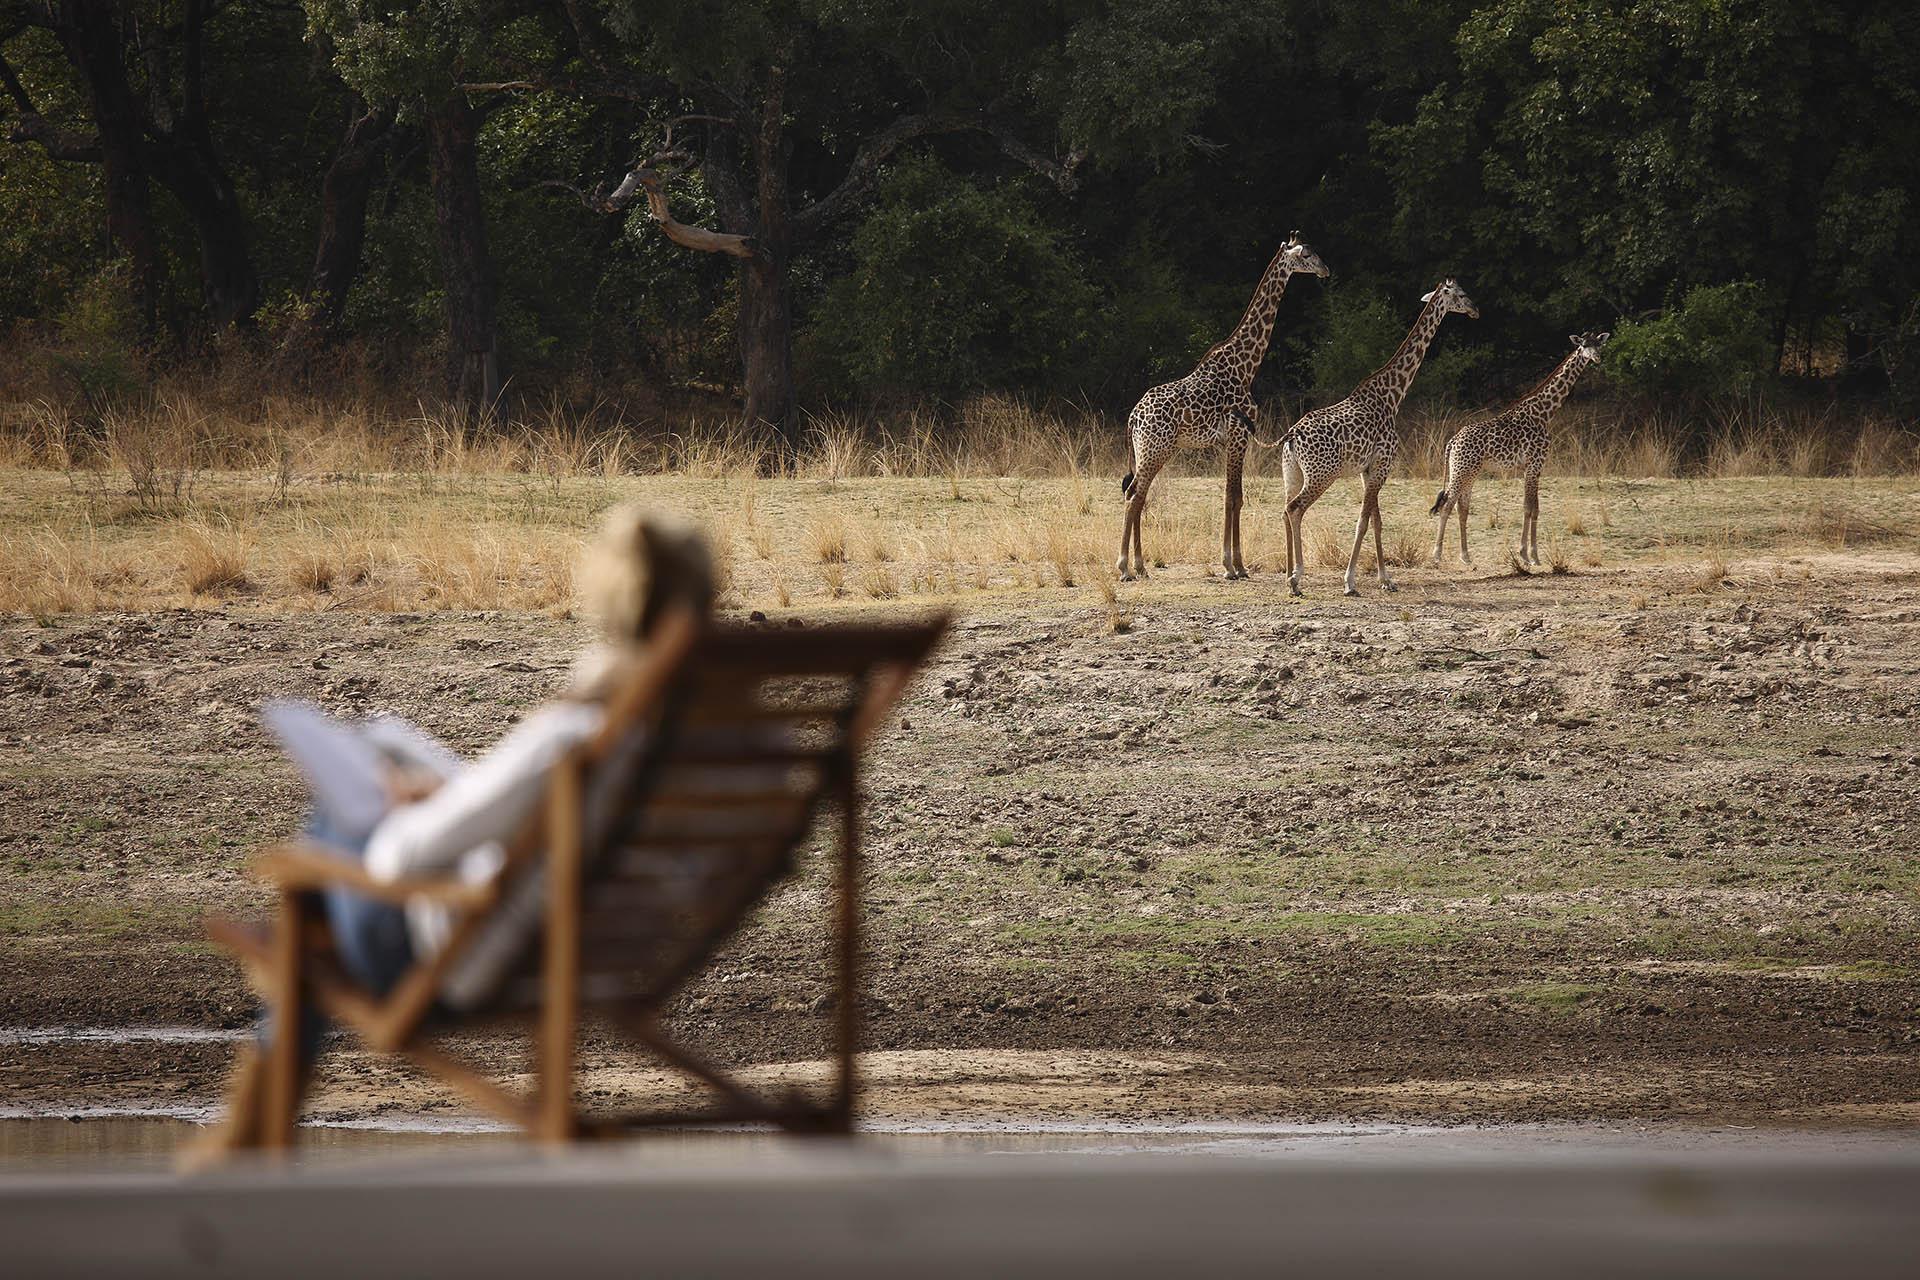 south luangwa national park tours-northern-explorer-15-nights-bush-beach-safaris-tours-malawi-adventures-experiences-holidays-specialist-tour-operator-chinzombo-giraffe